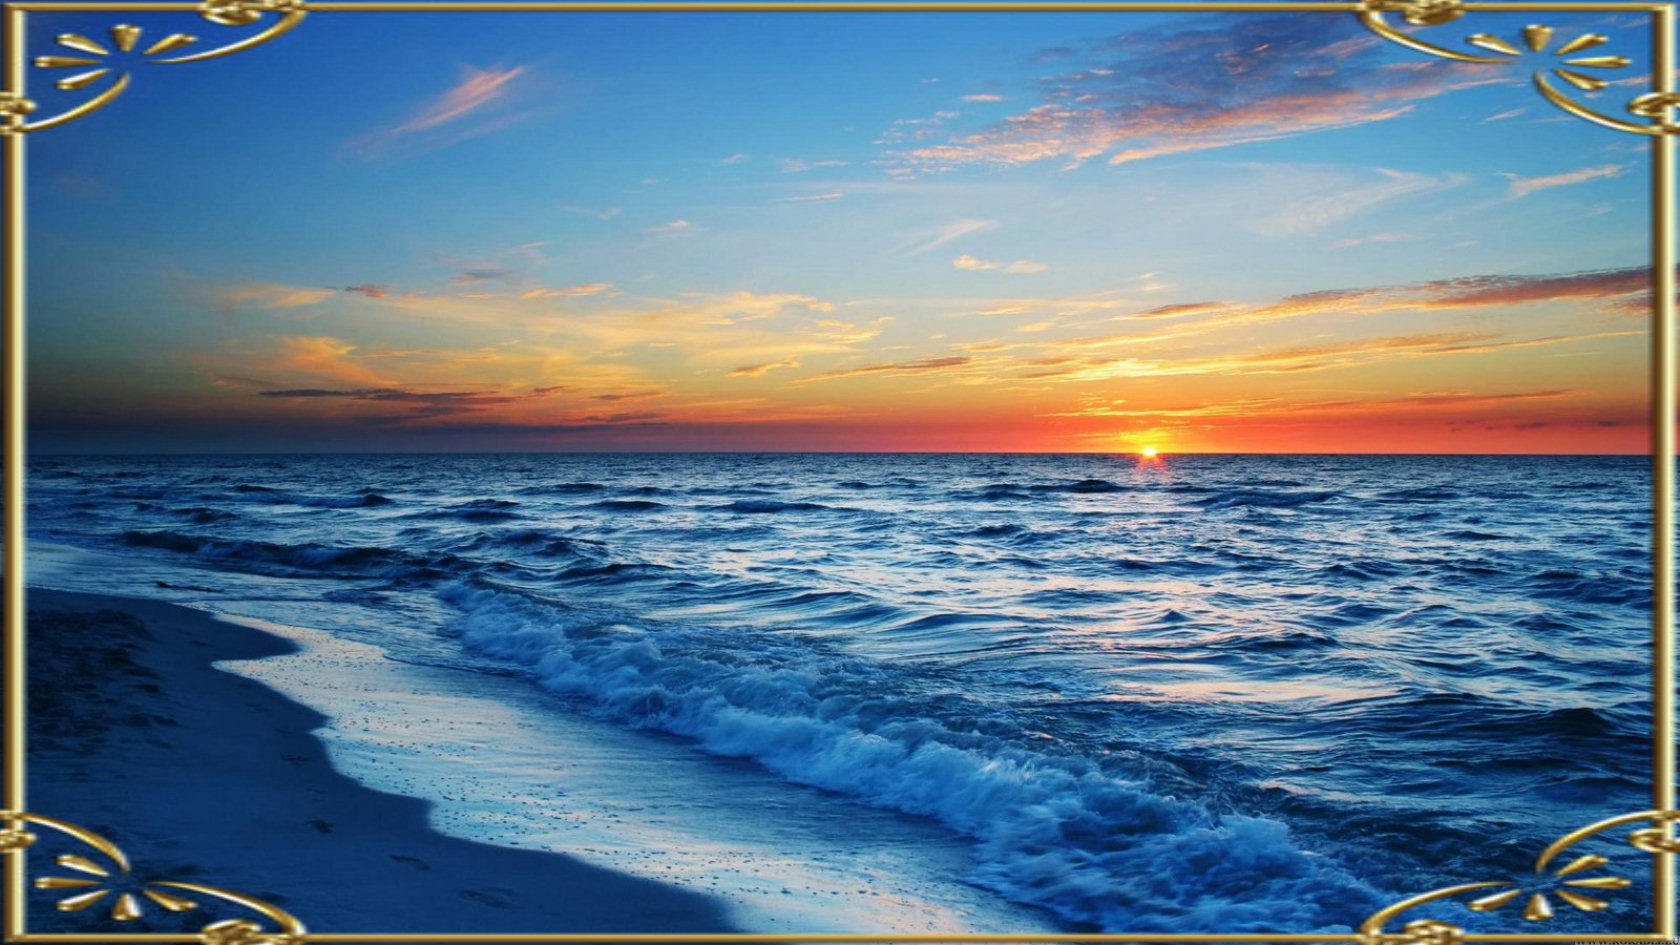 Картинки открытки фото небо голубое море голубое